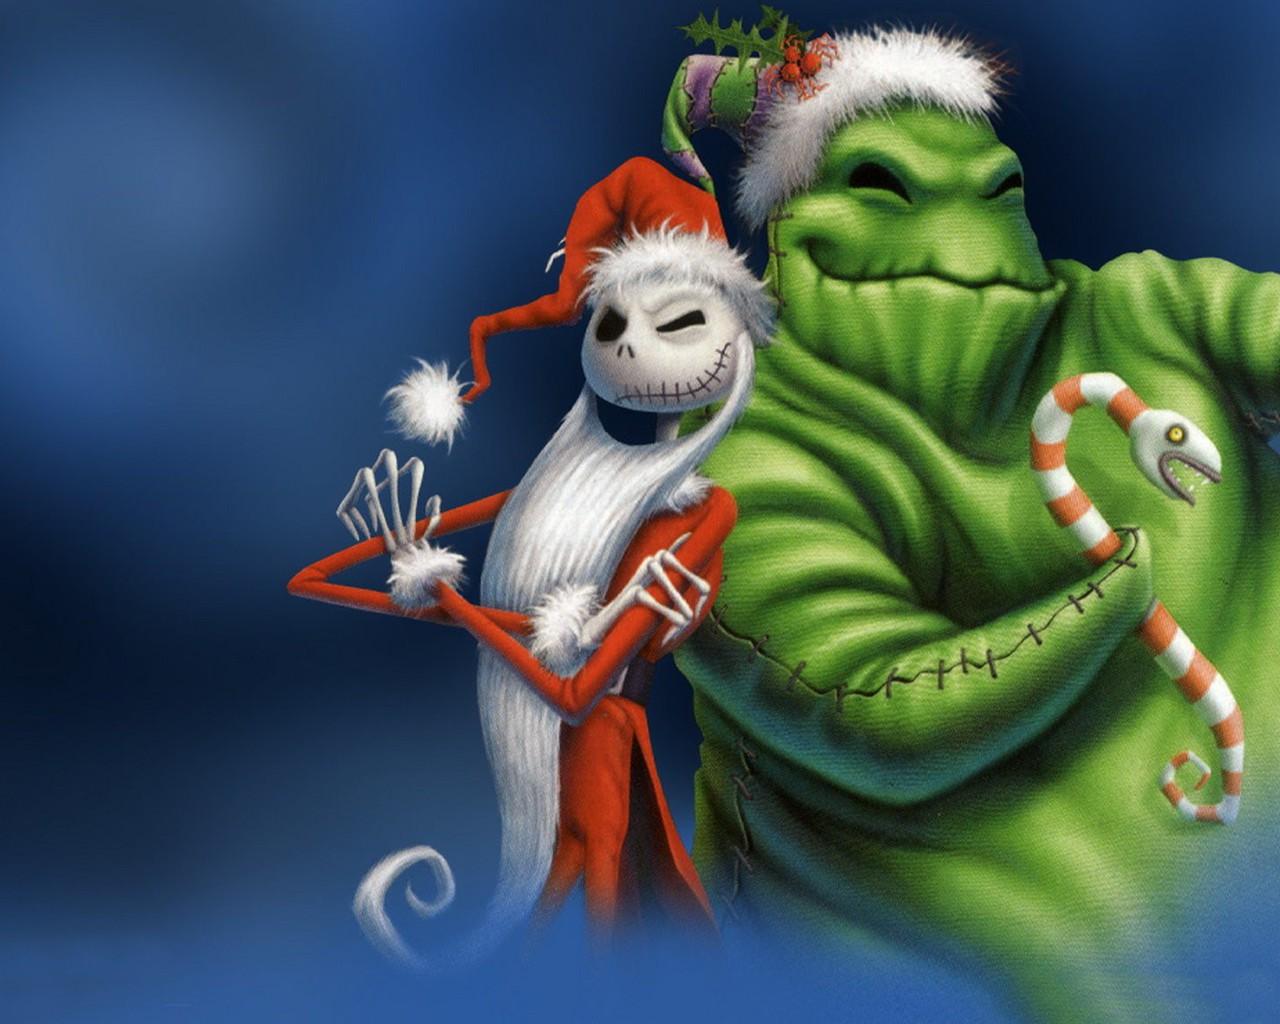 Christmas Night Wallpaper